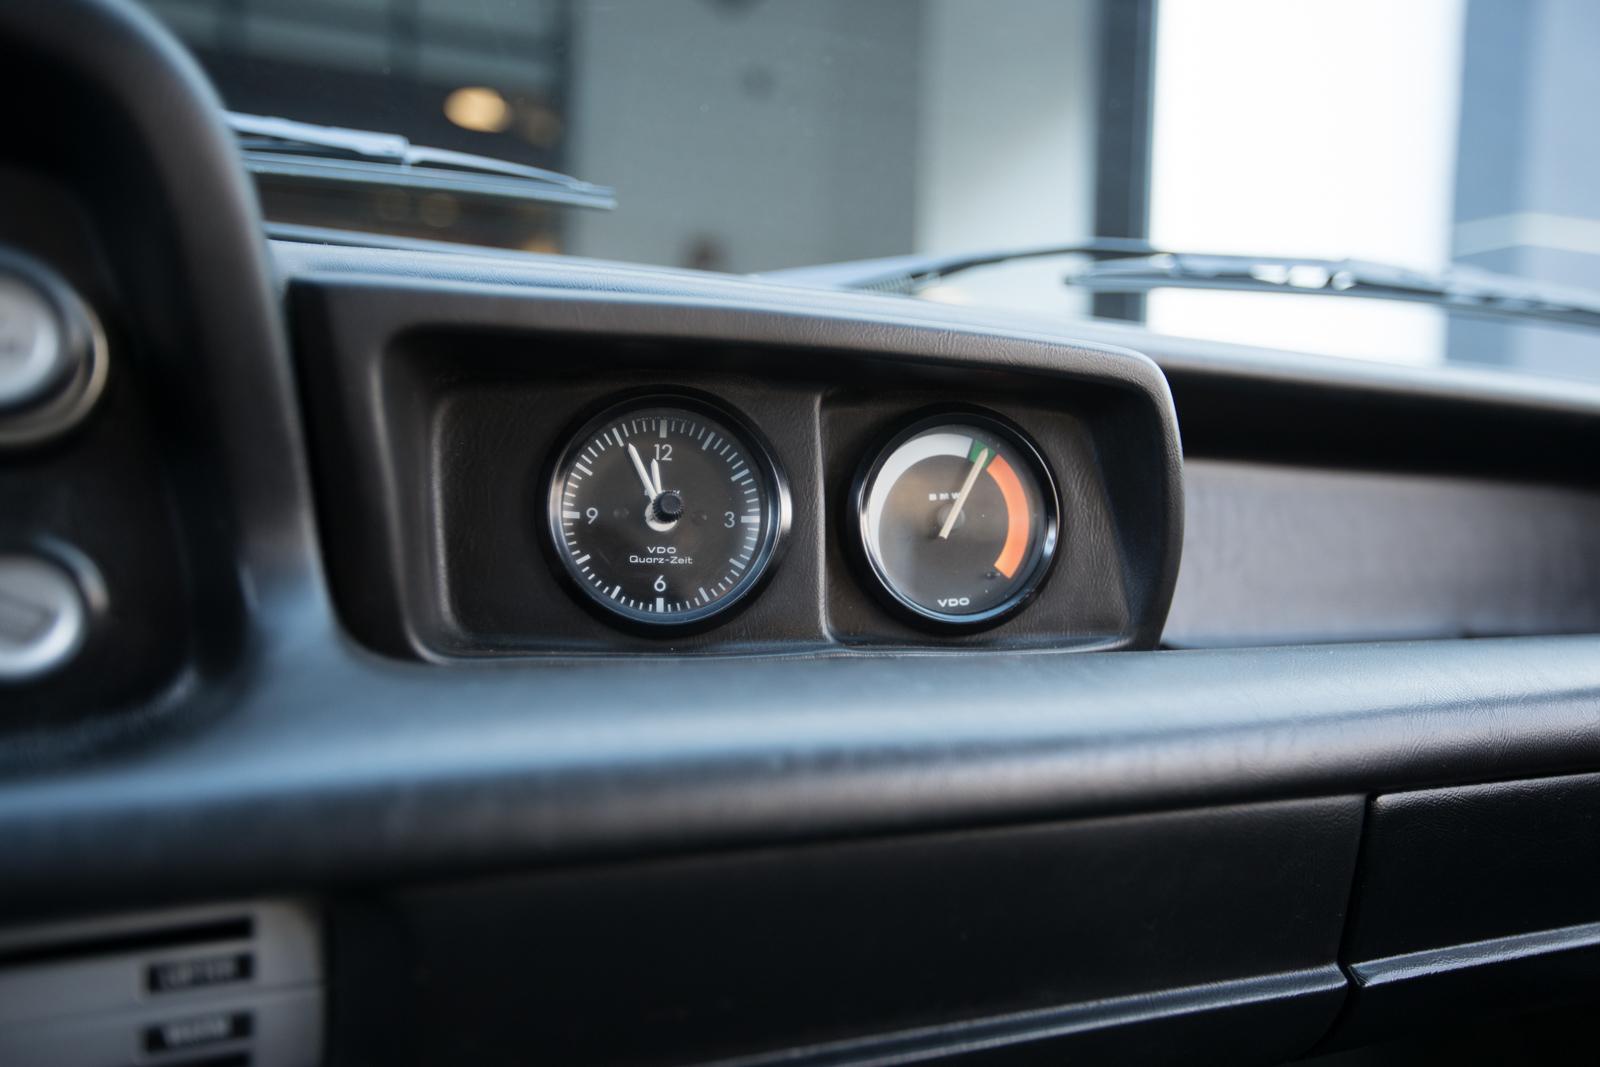 1974 BMW 2002 Turbo boost gauge